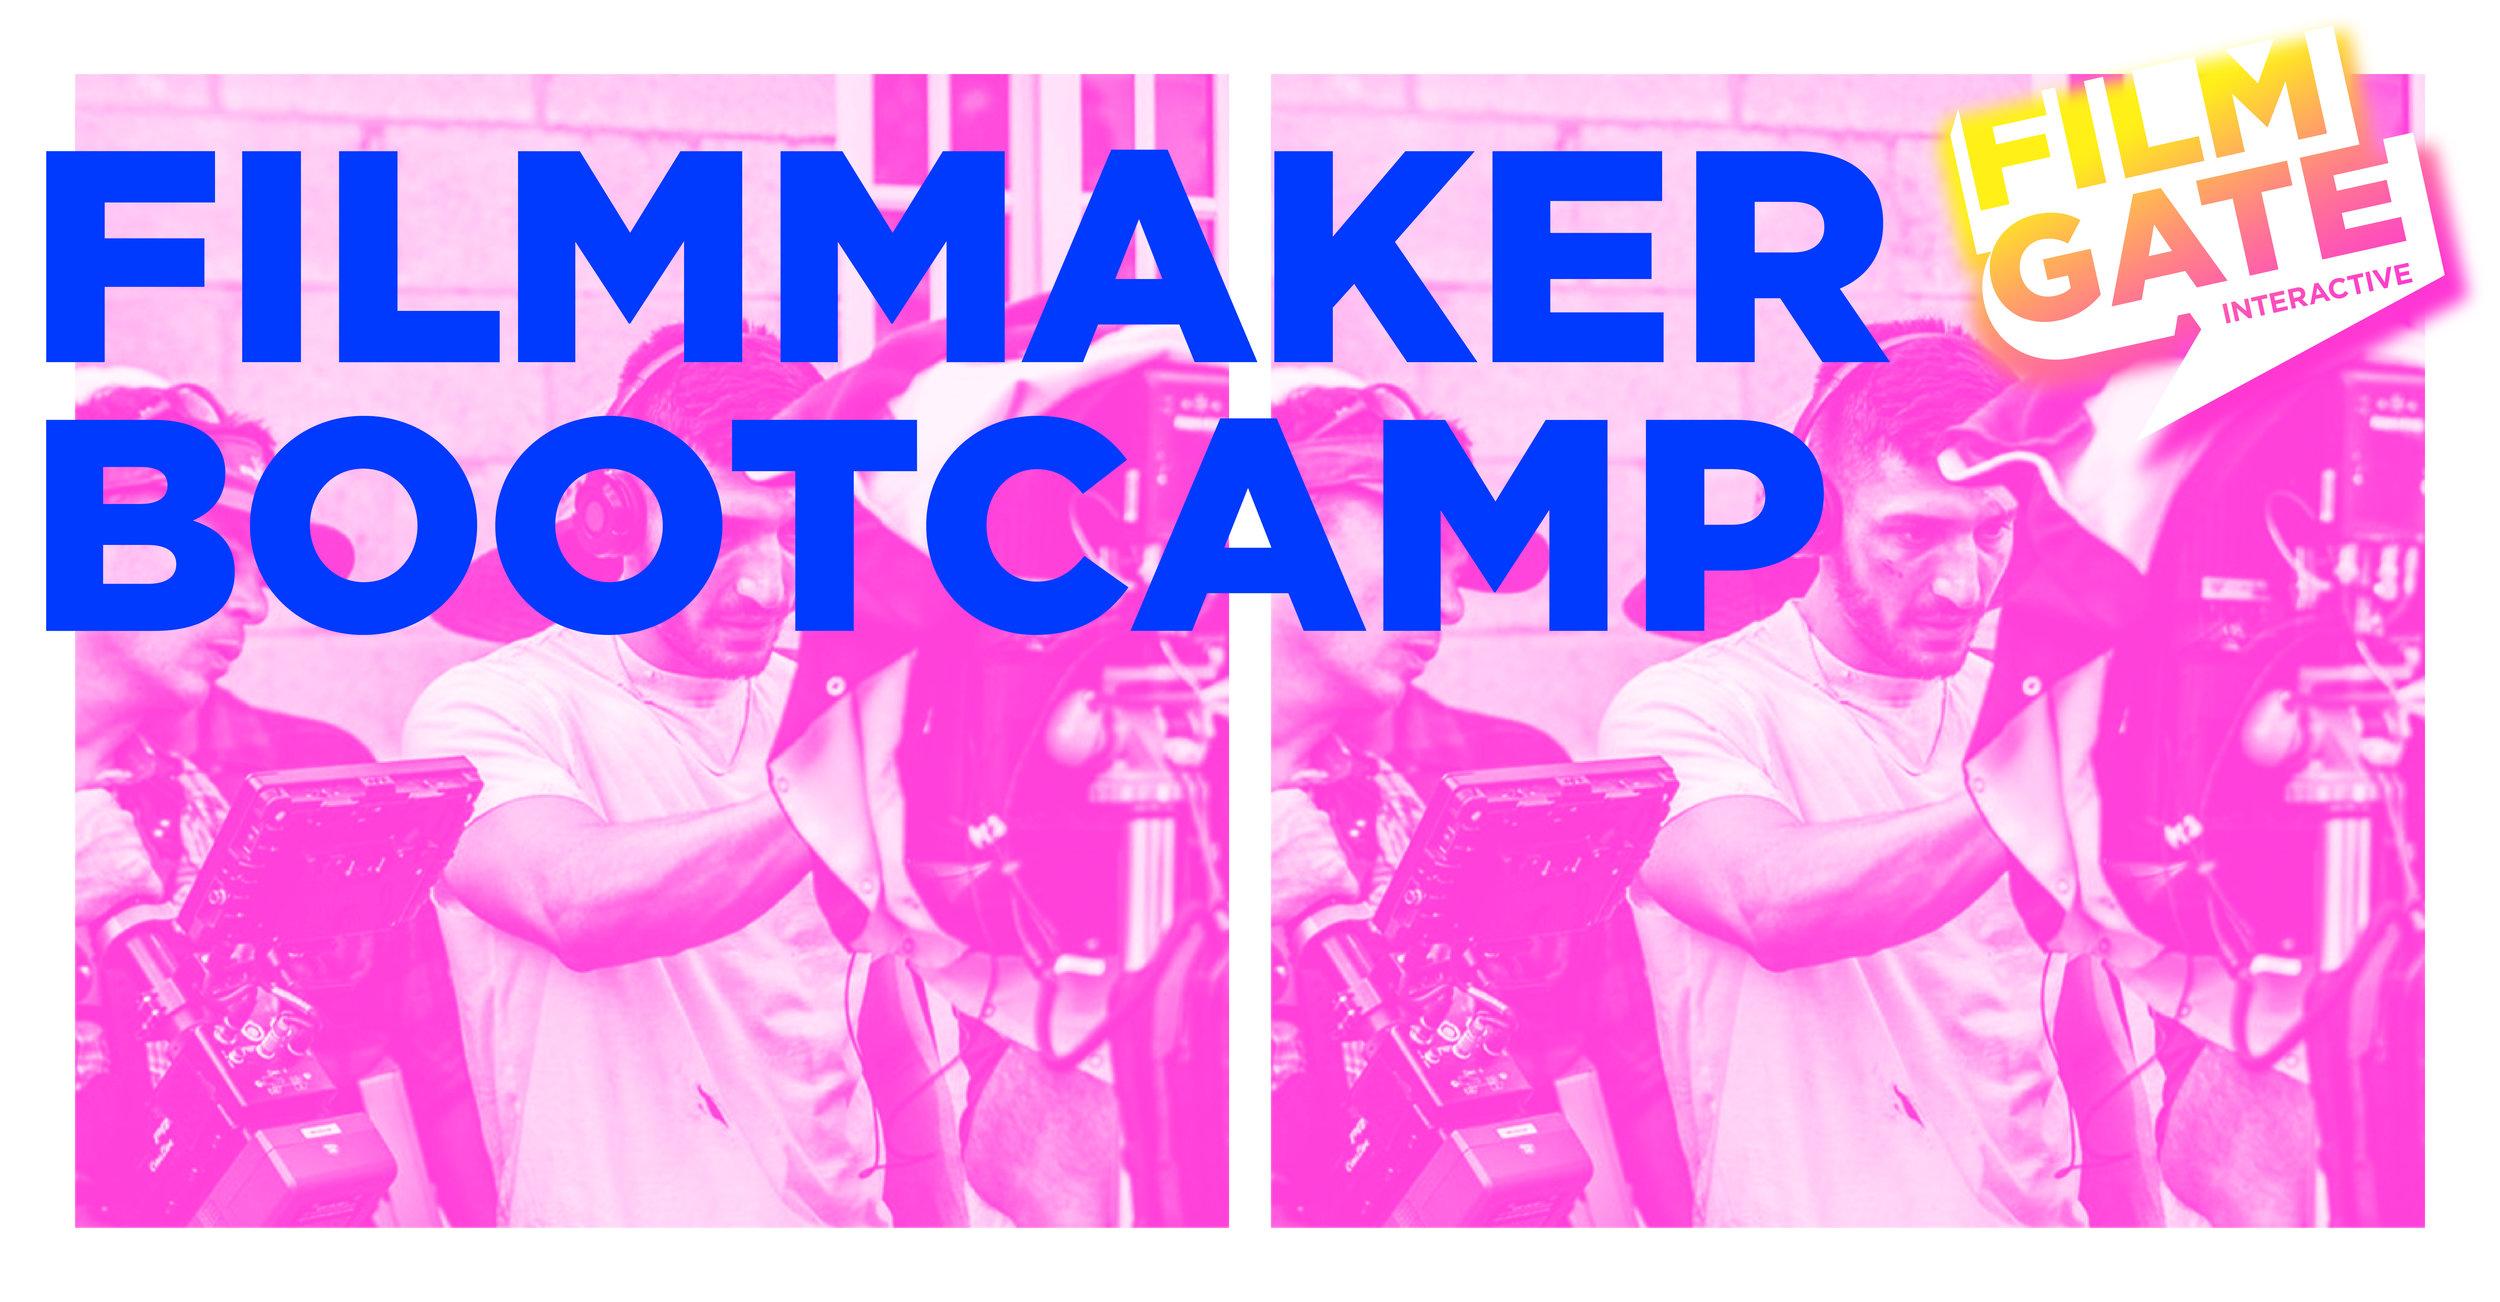 FG_FilmmakerBootcampFB-event_1-01.jpg